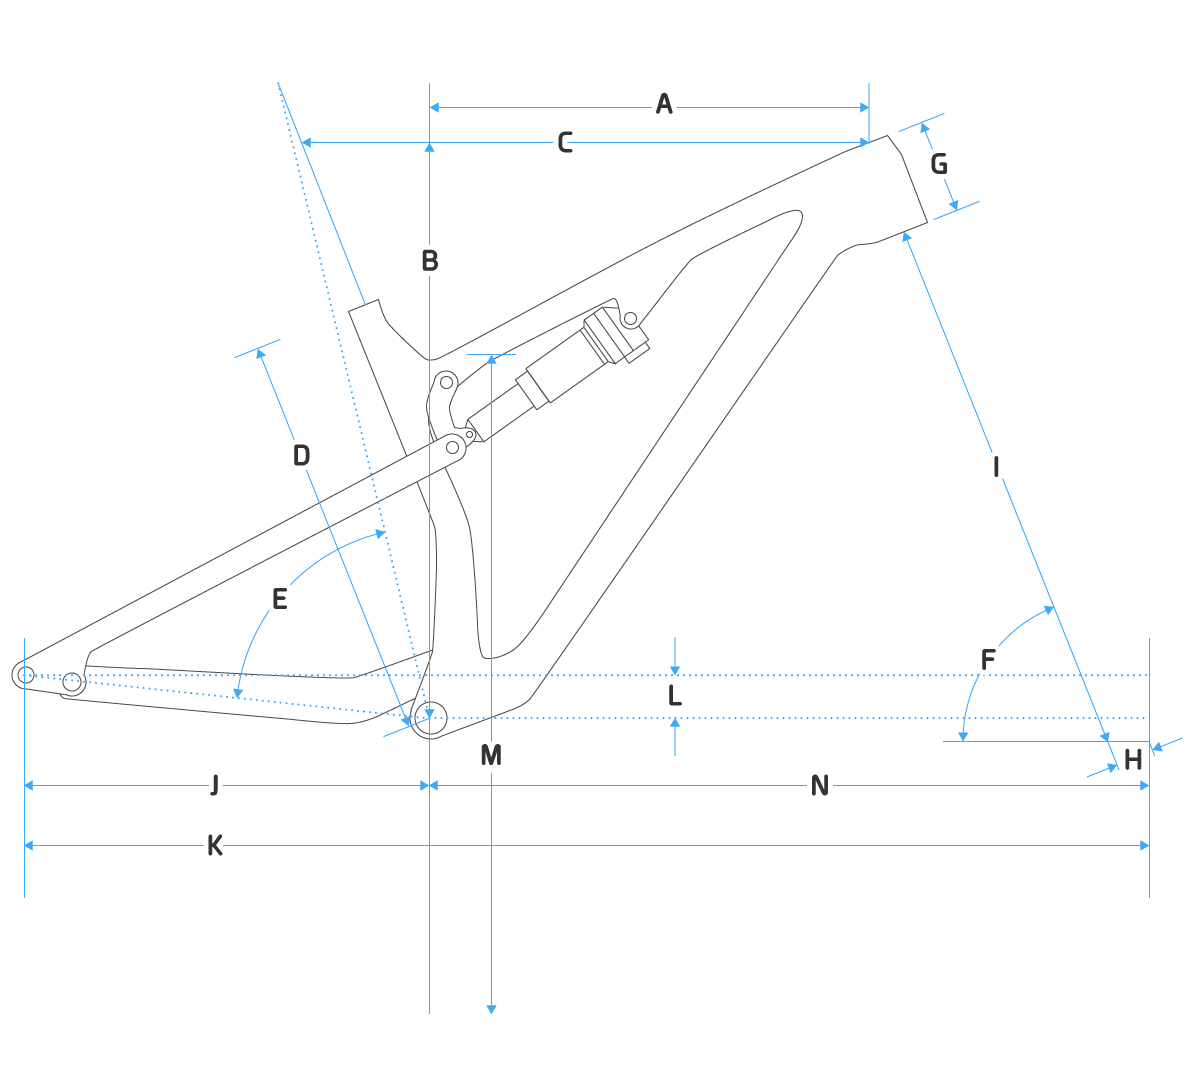 Geometry Trail V1